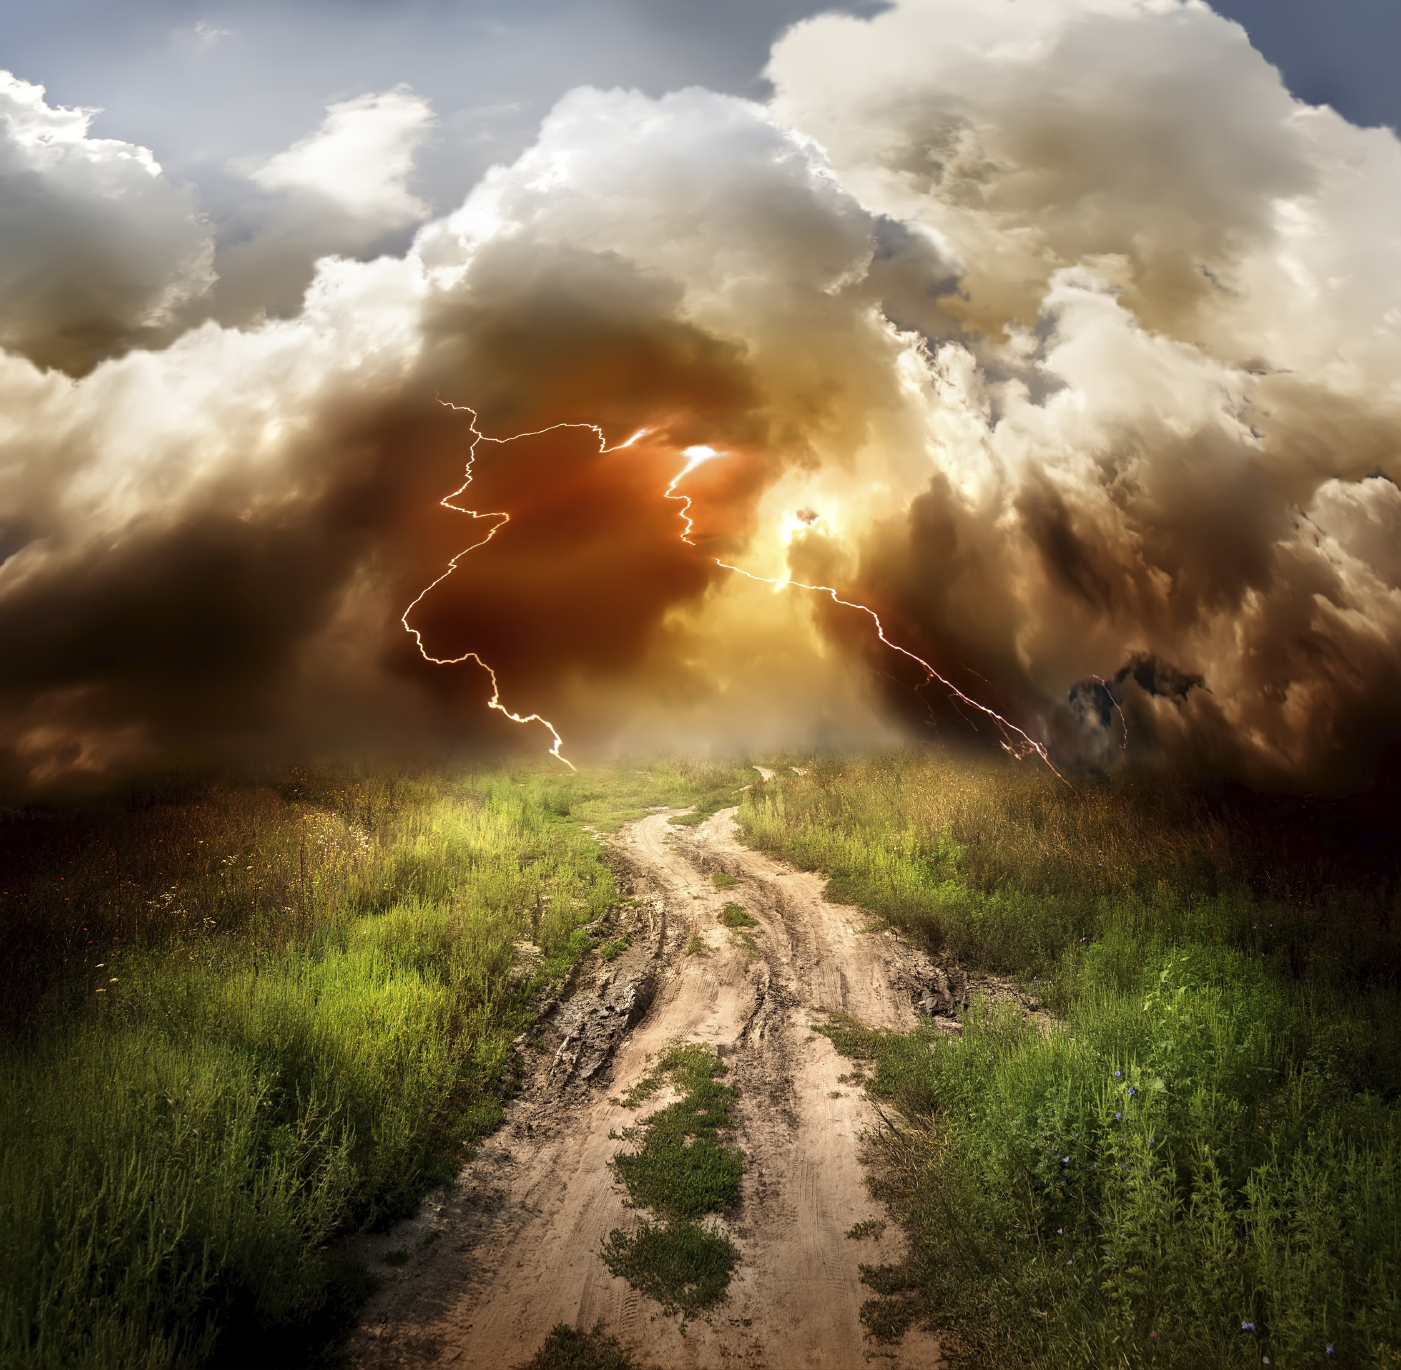 Assemble them for battle: Revelation 16:14-16 ... - photo#14